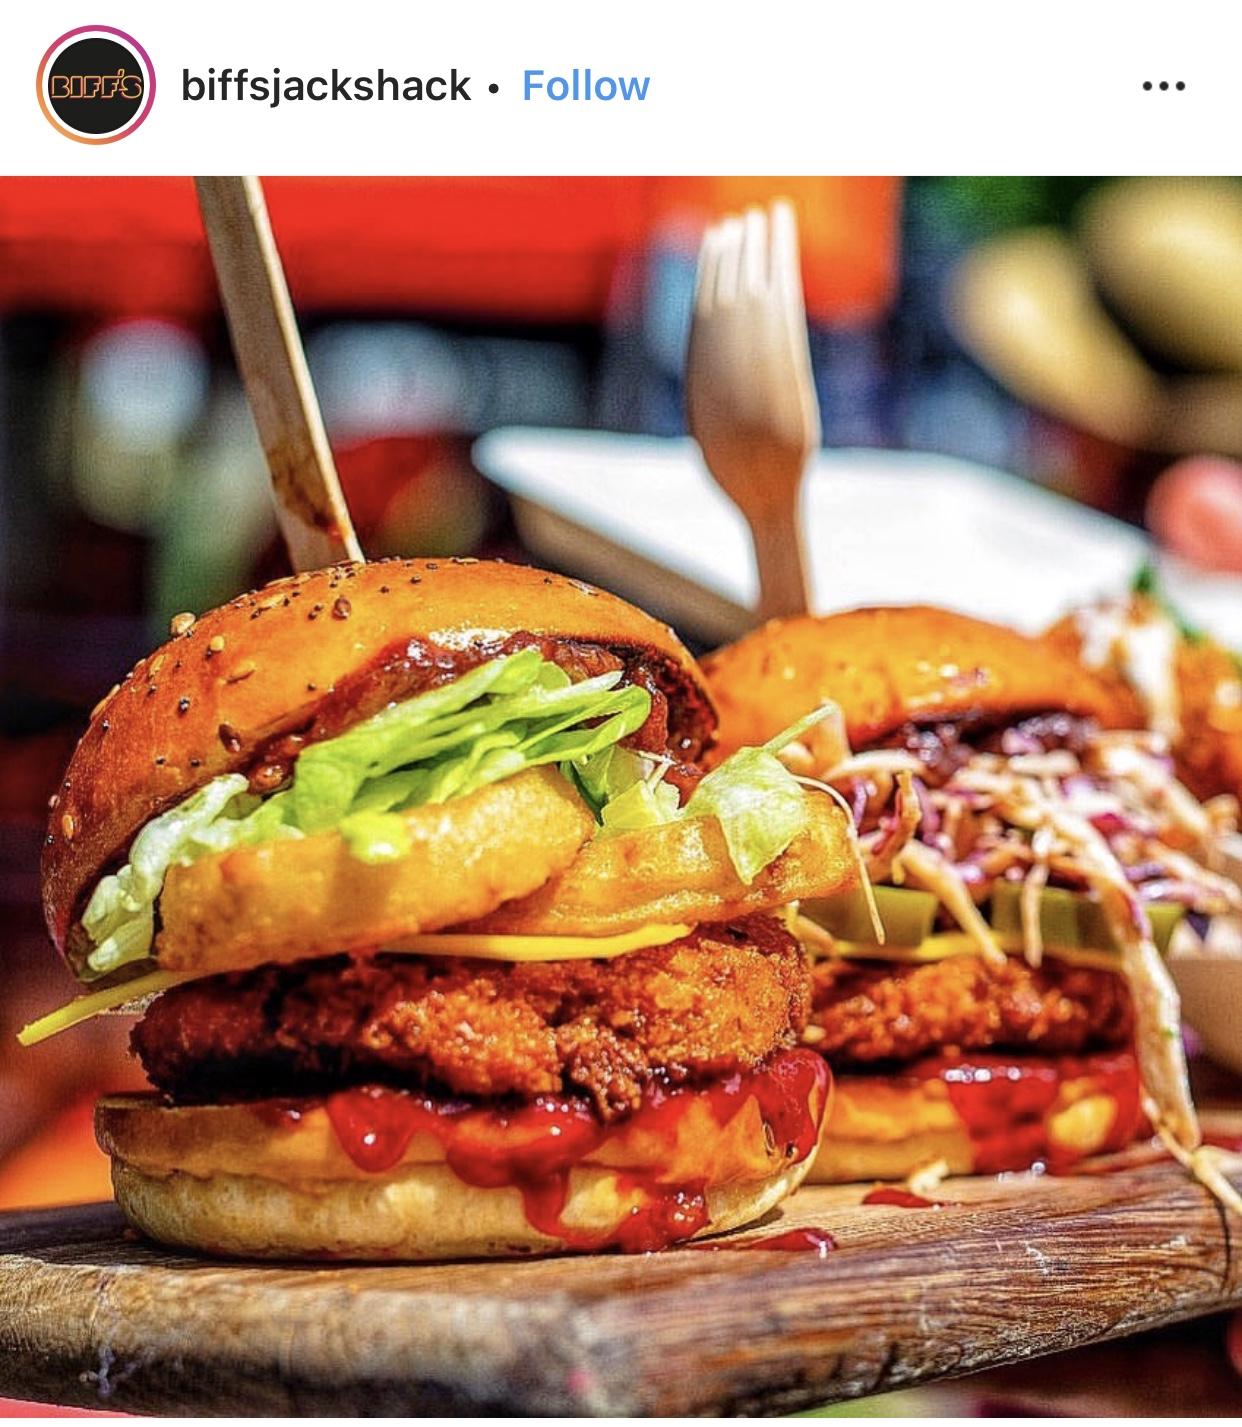 BRIGHT Zine | Best Vegan London Burgers - BIFFS Jack Shack Vegan Kitchen.jpg